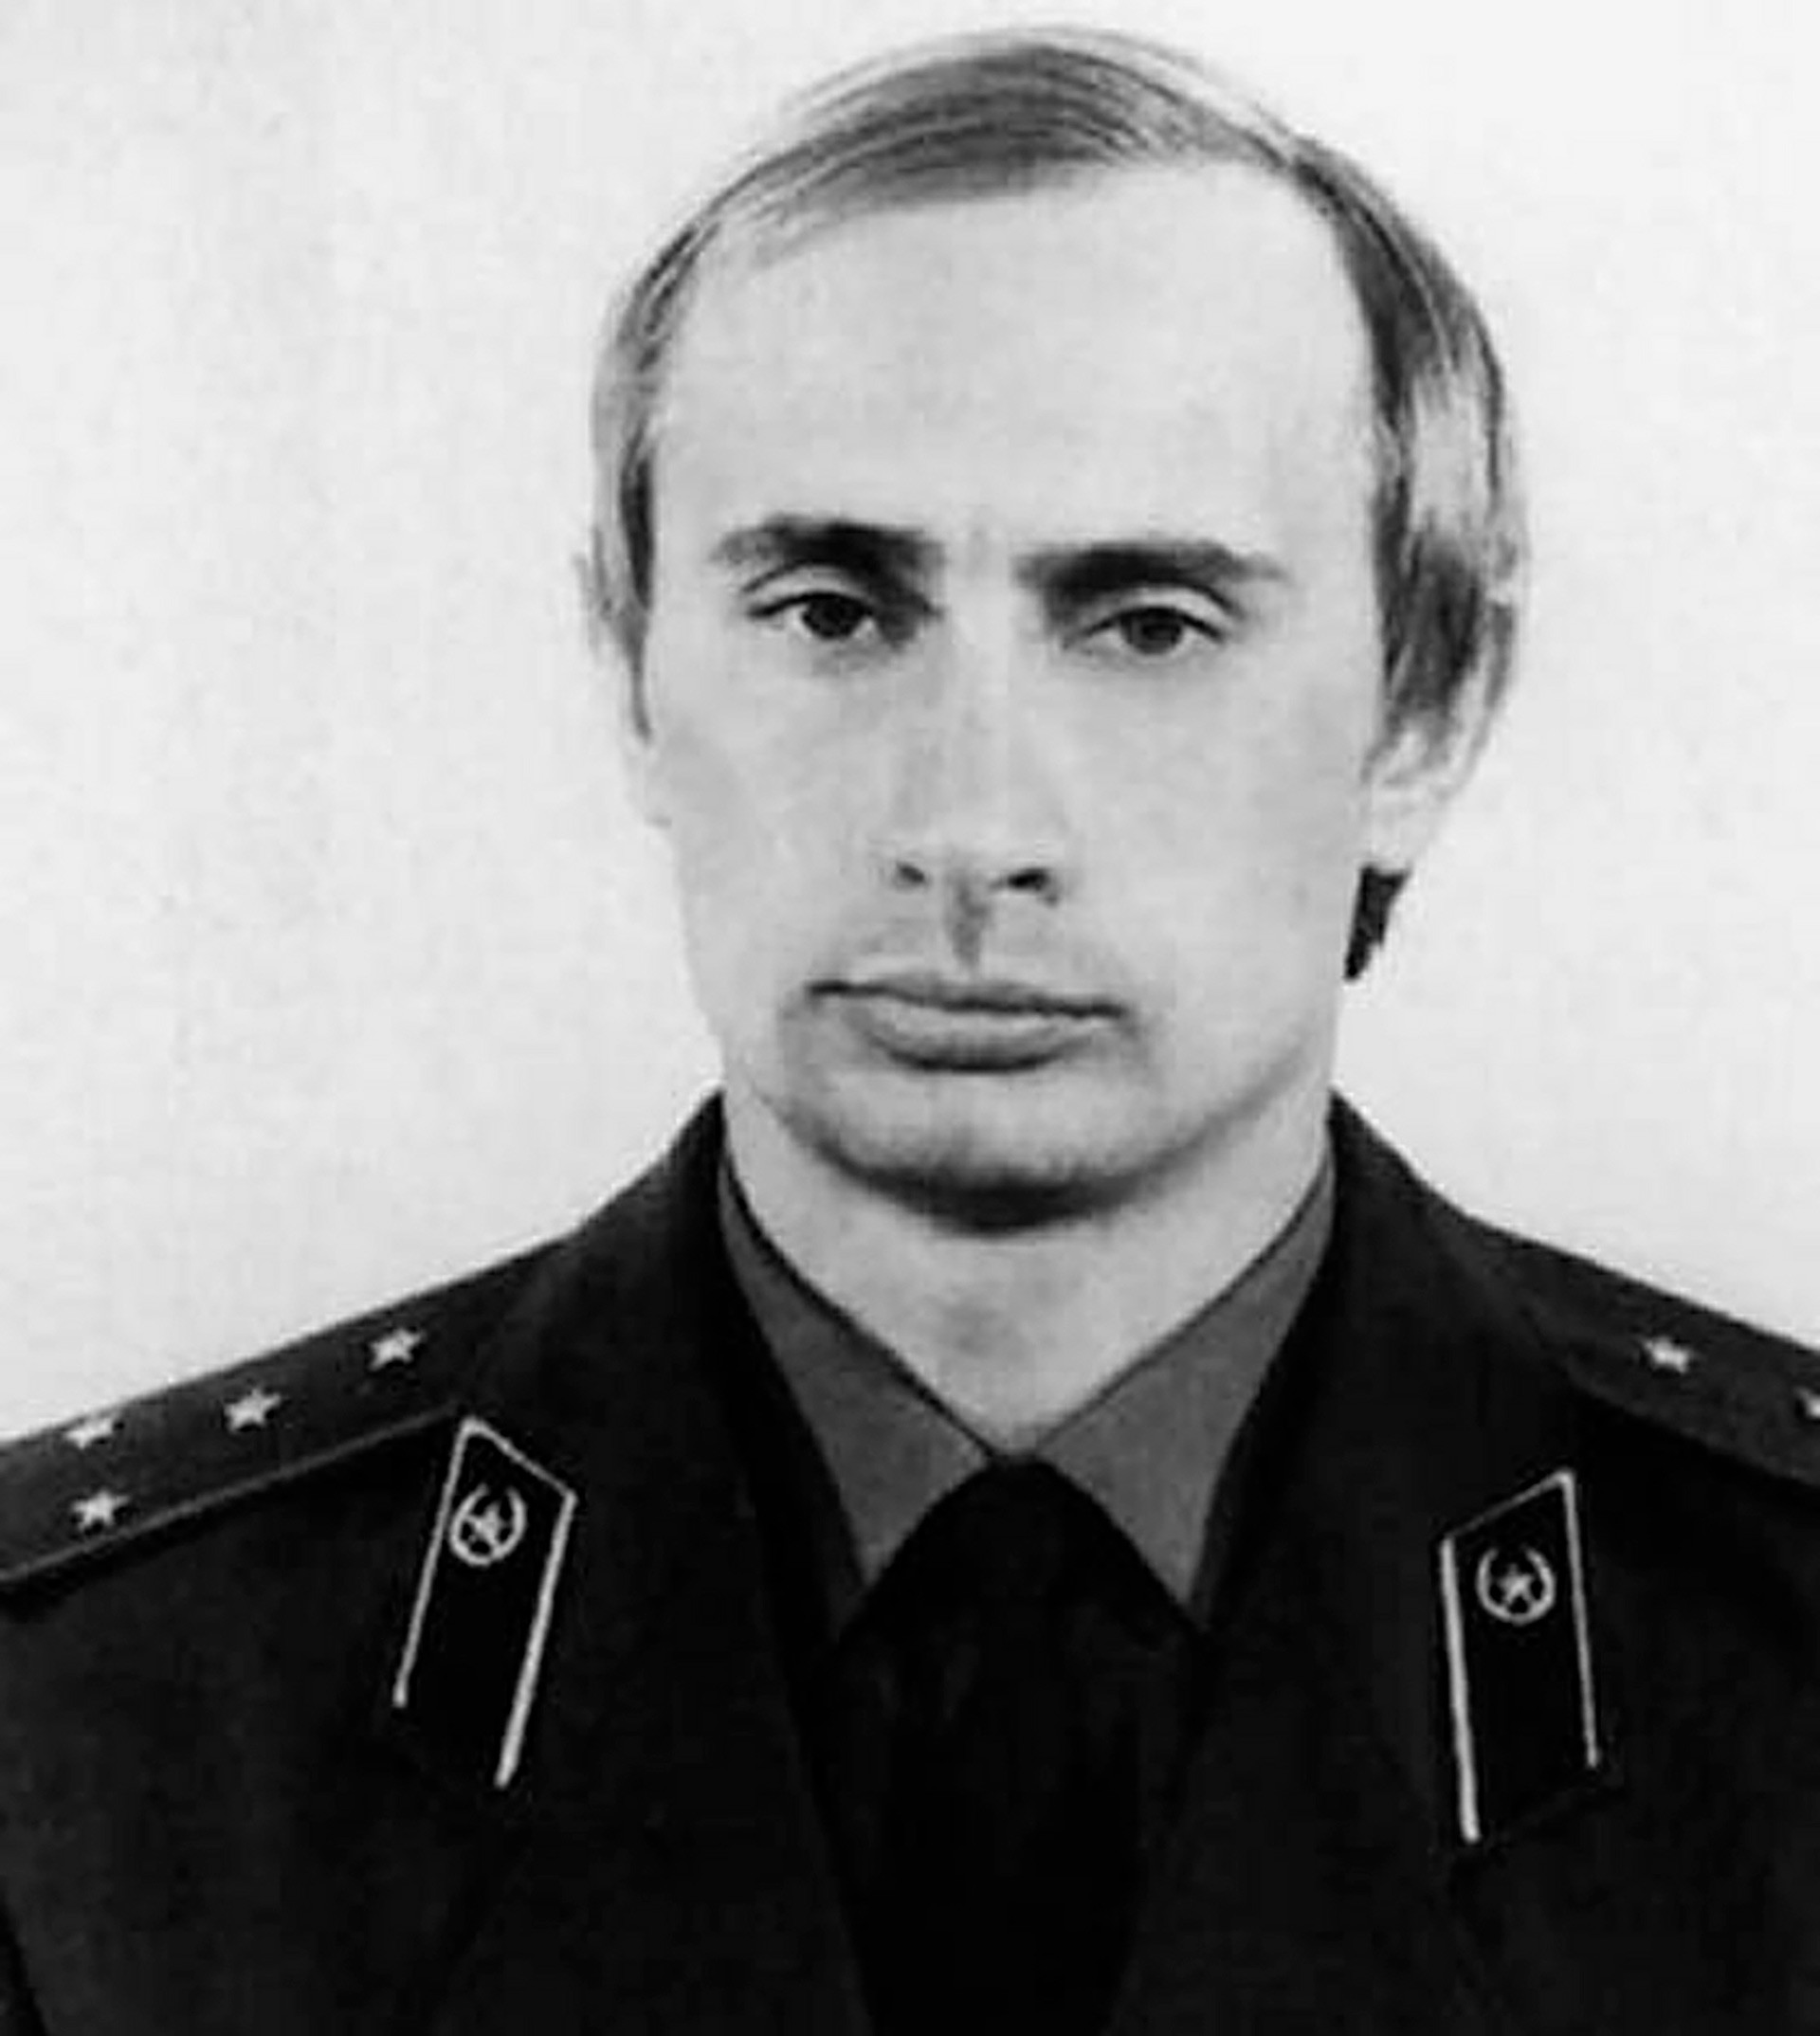 Путин у униформи КГБ-а, око 1980. године.